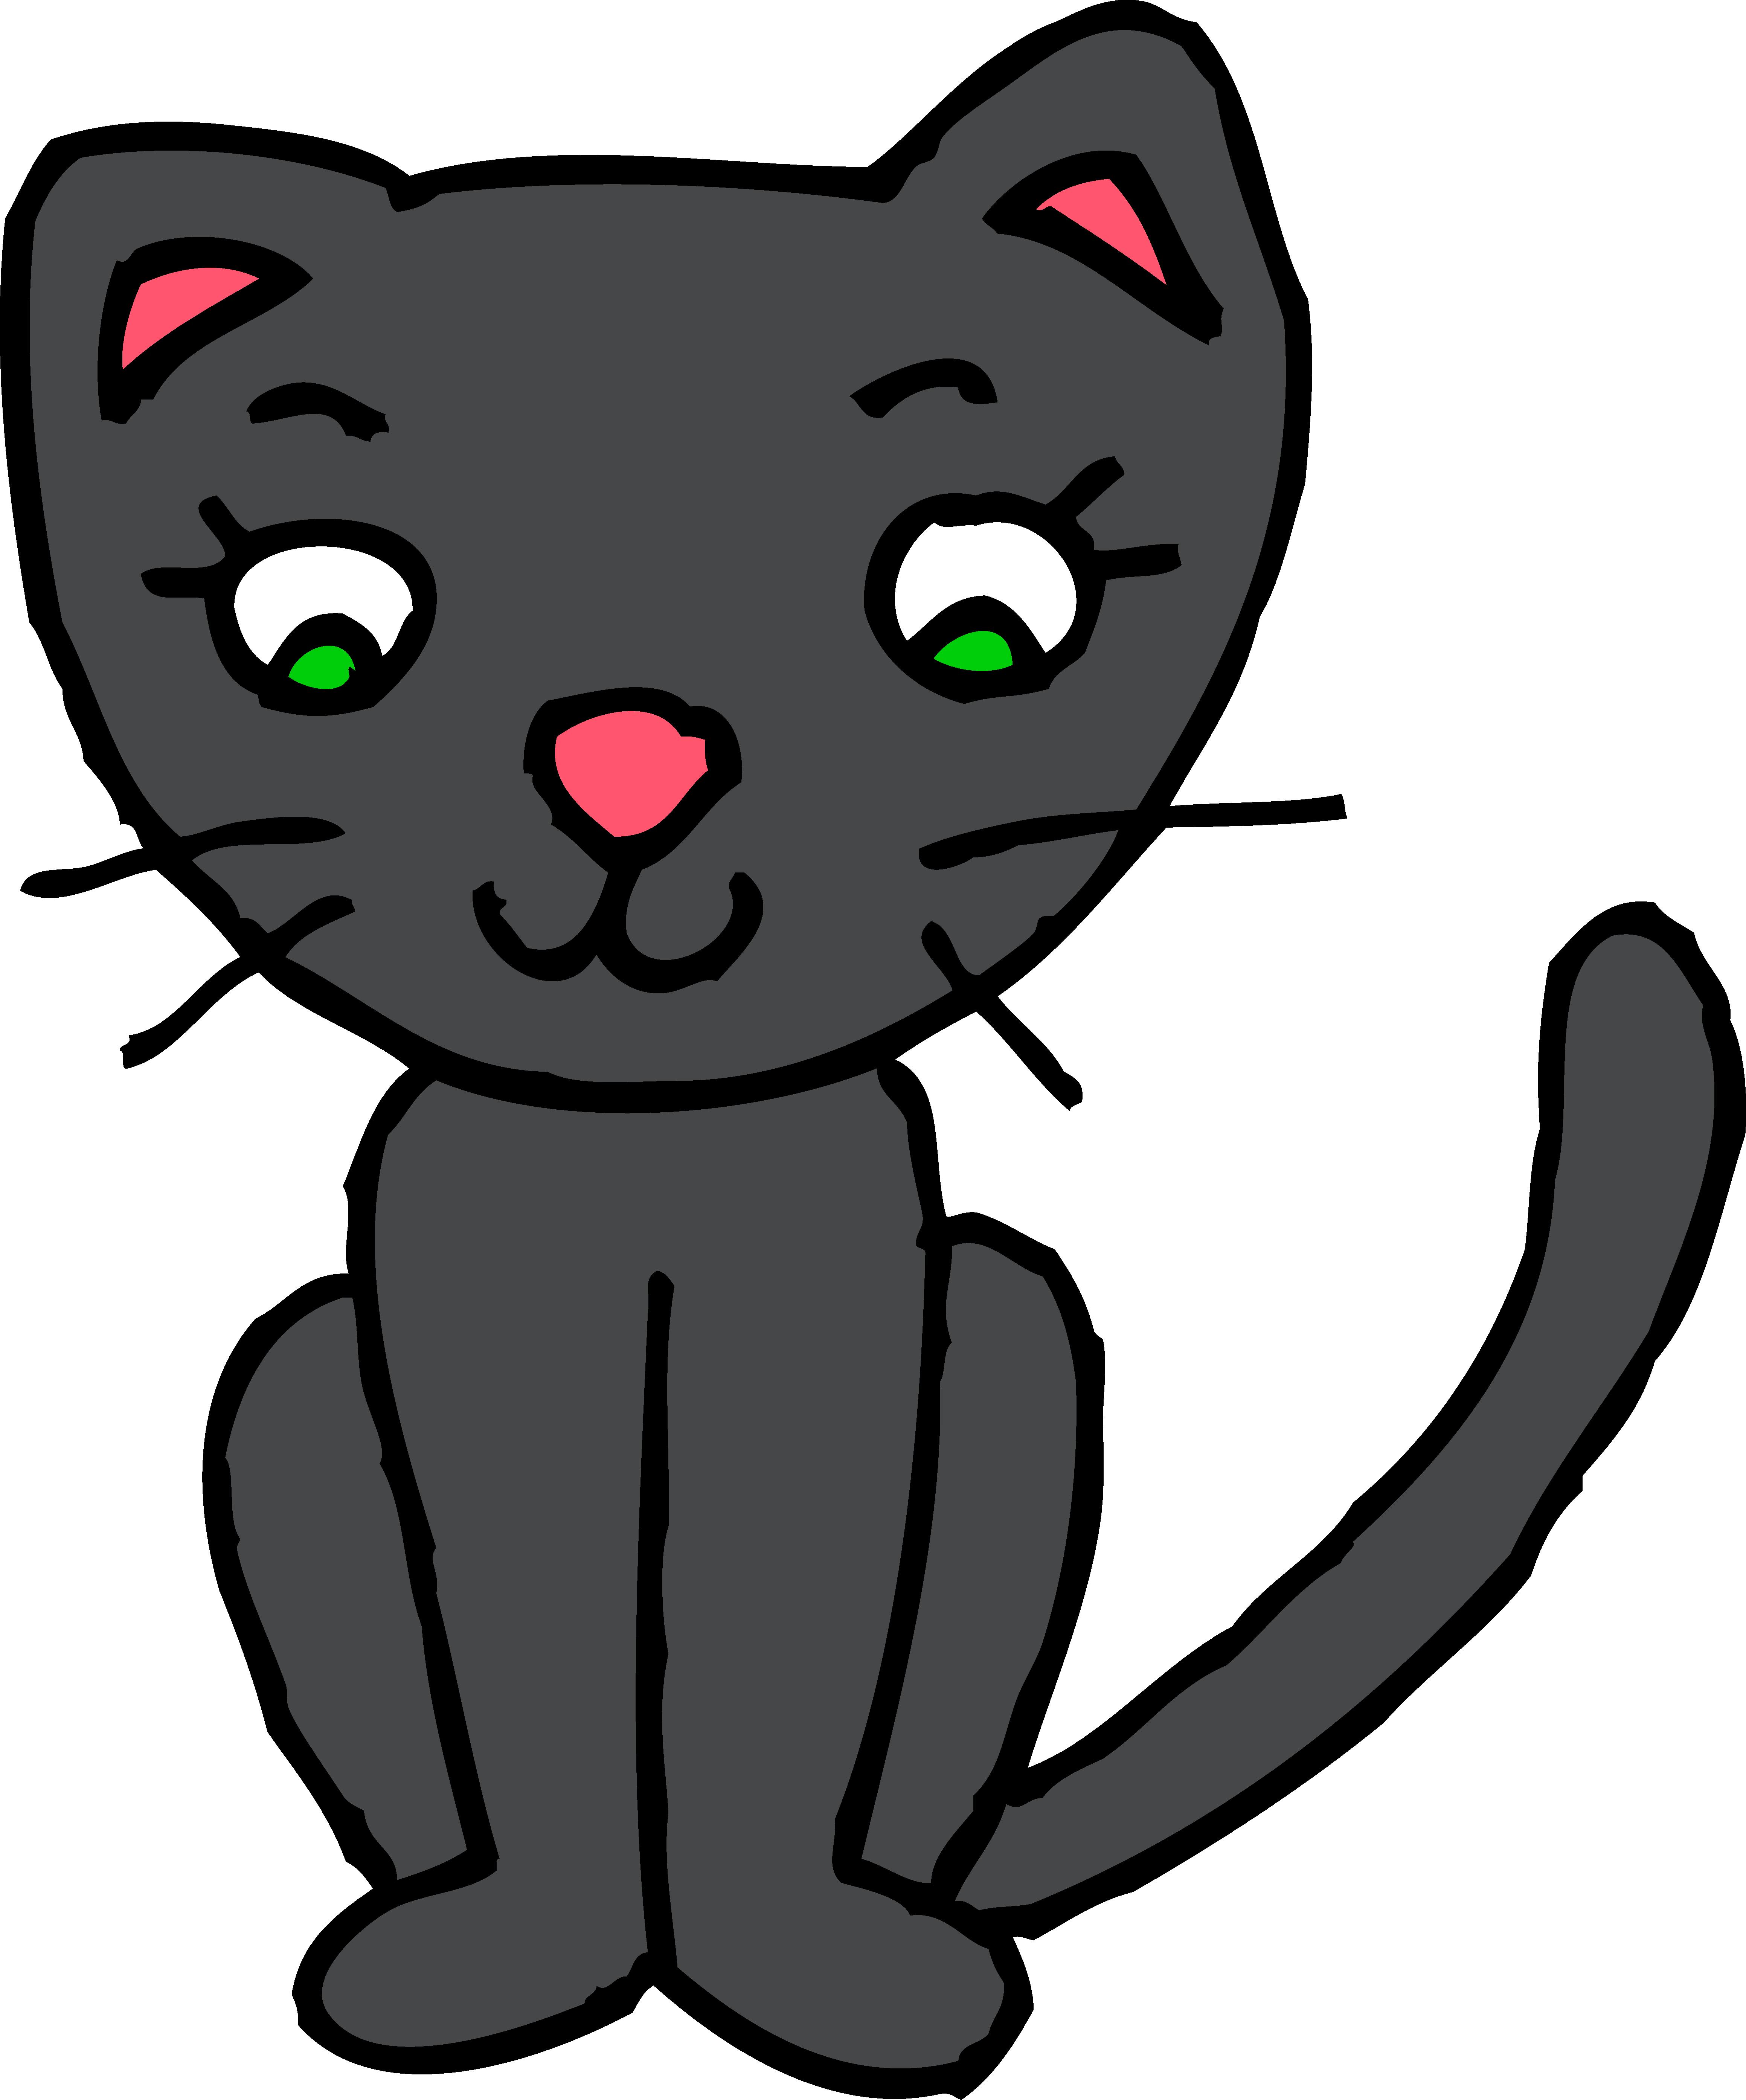 Cat Clipart Image #2461 - Cats Clipart